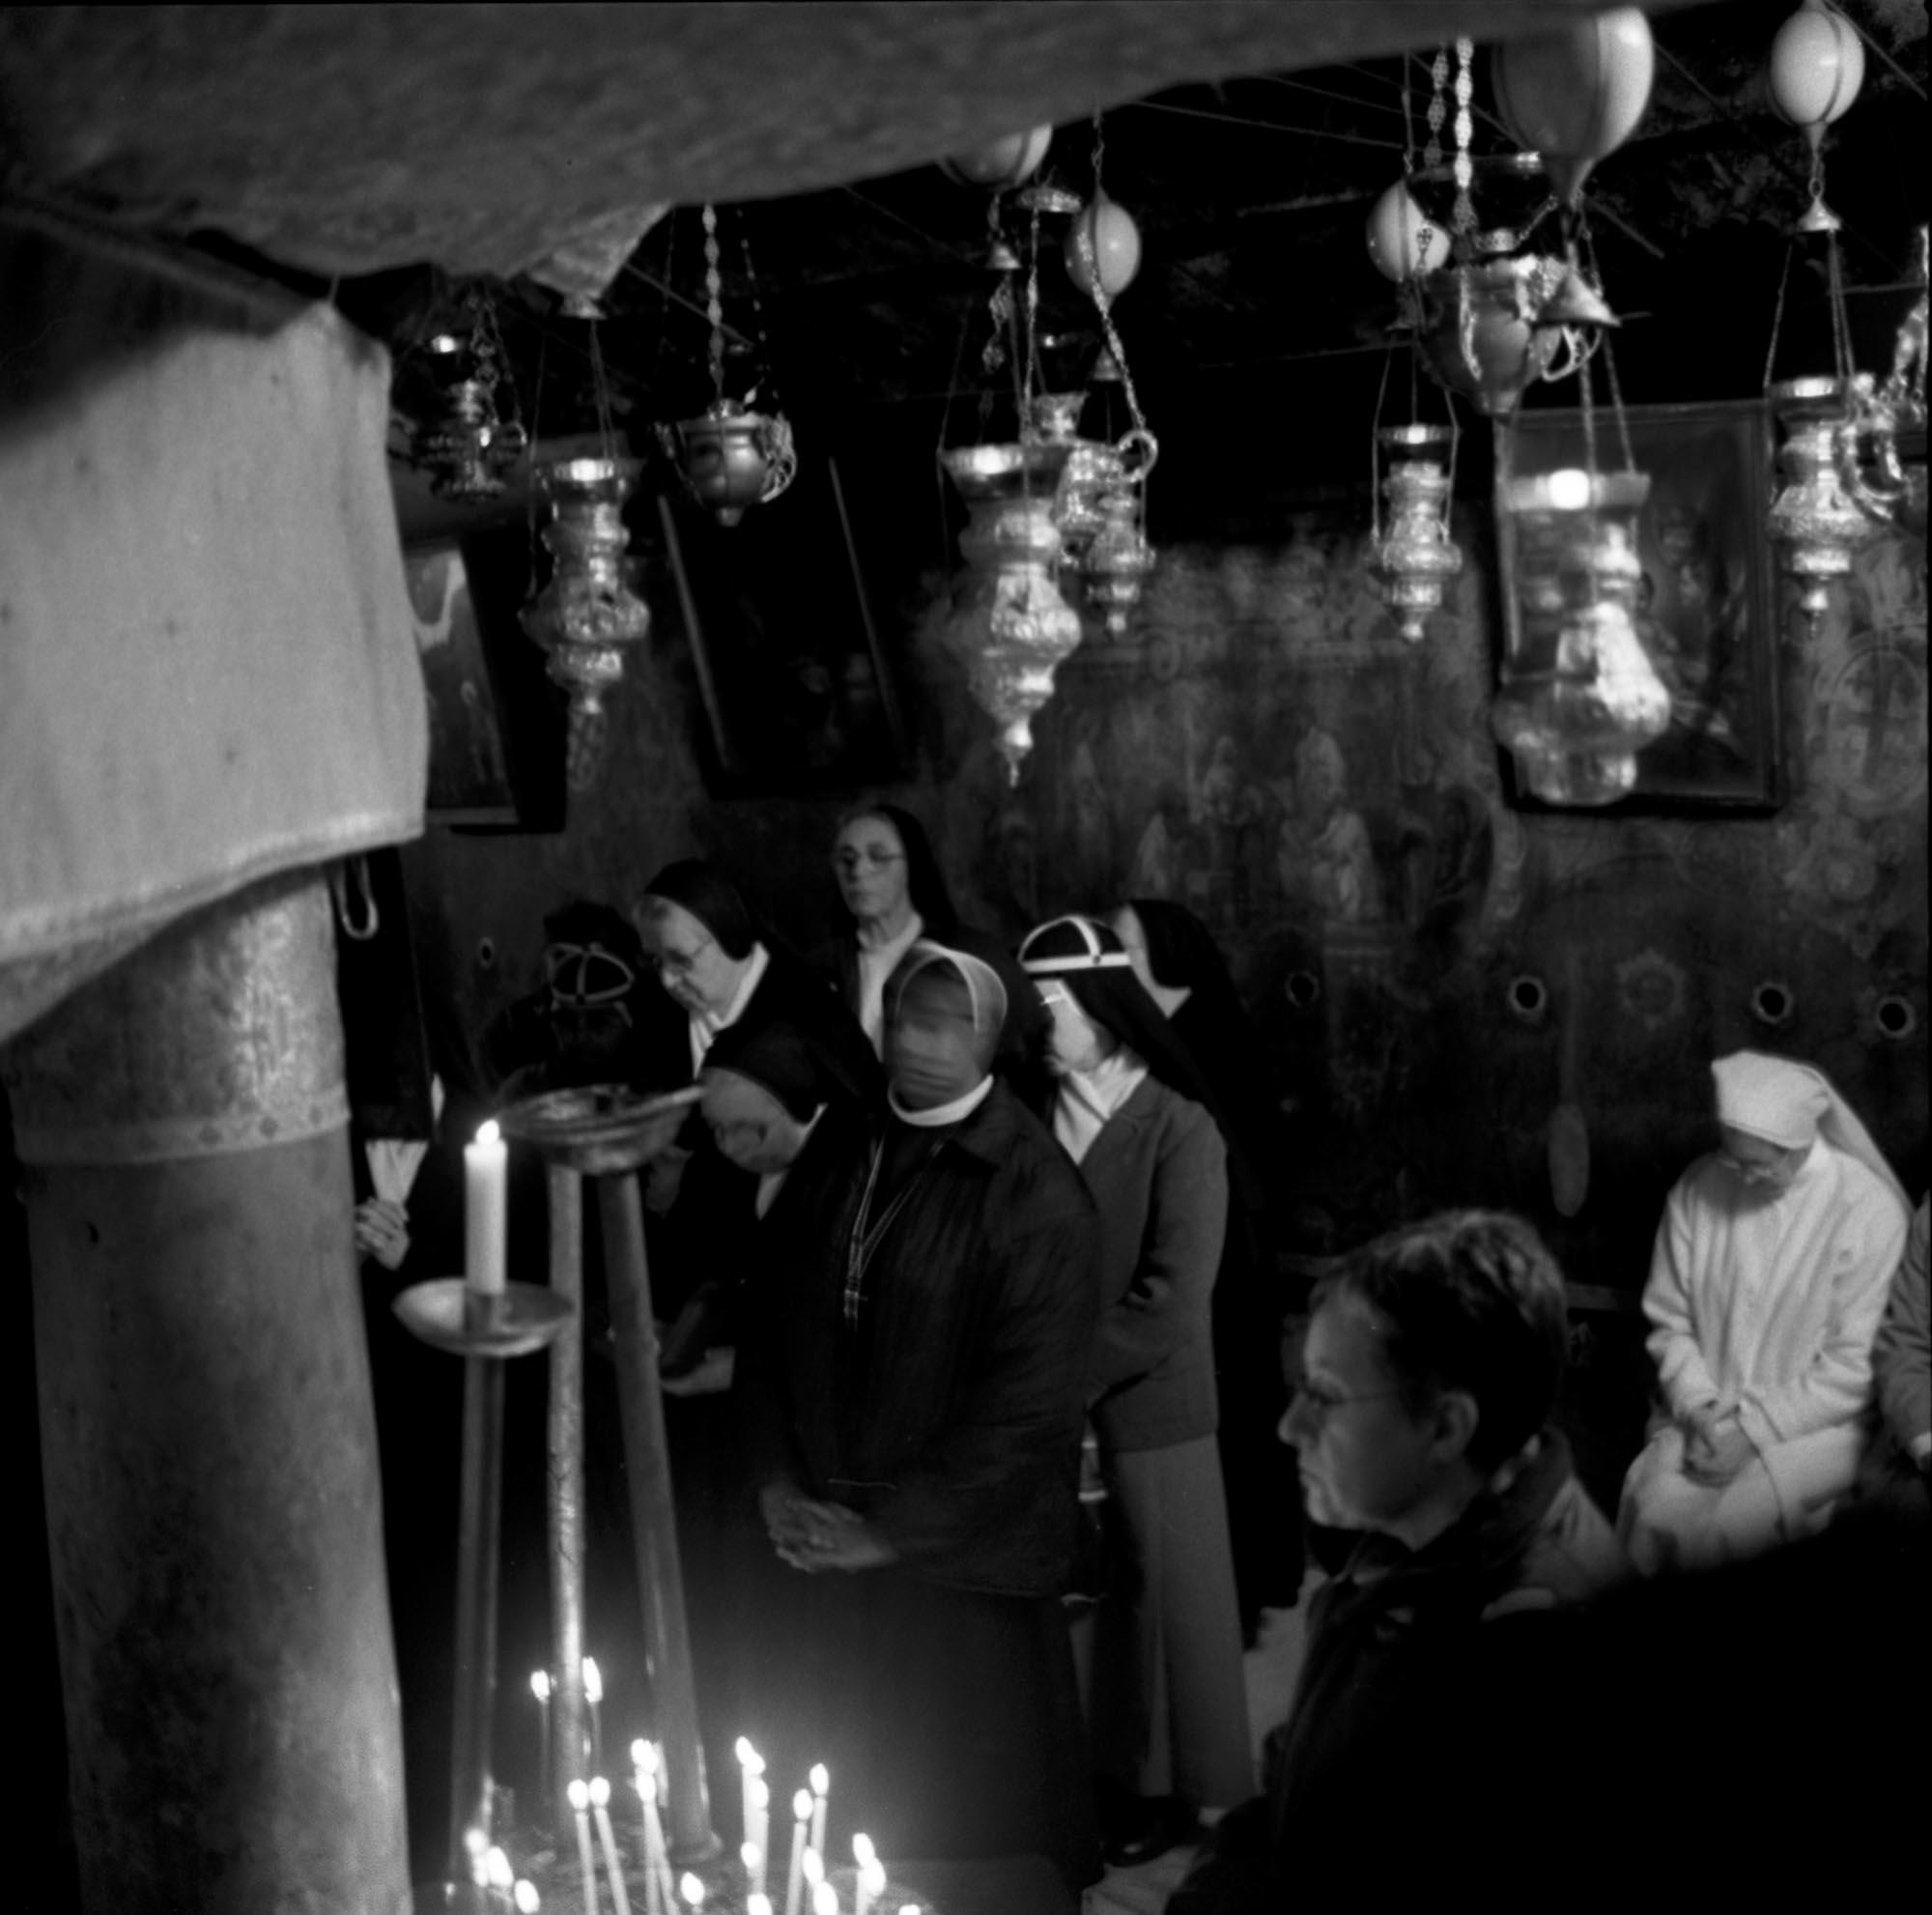 In The Crypt Of the Church of Nativity, Bethlehem, Christmas Eve, 2002